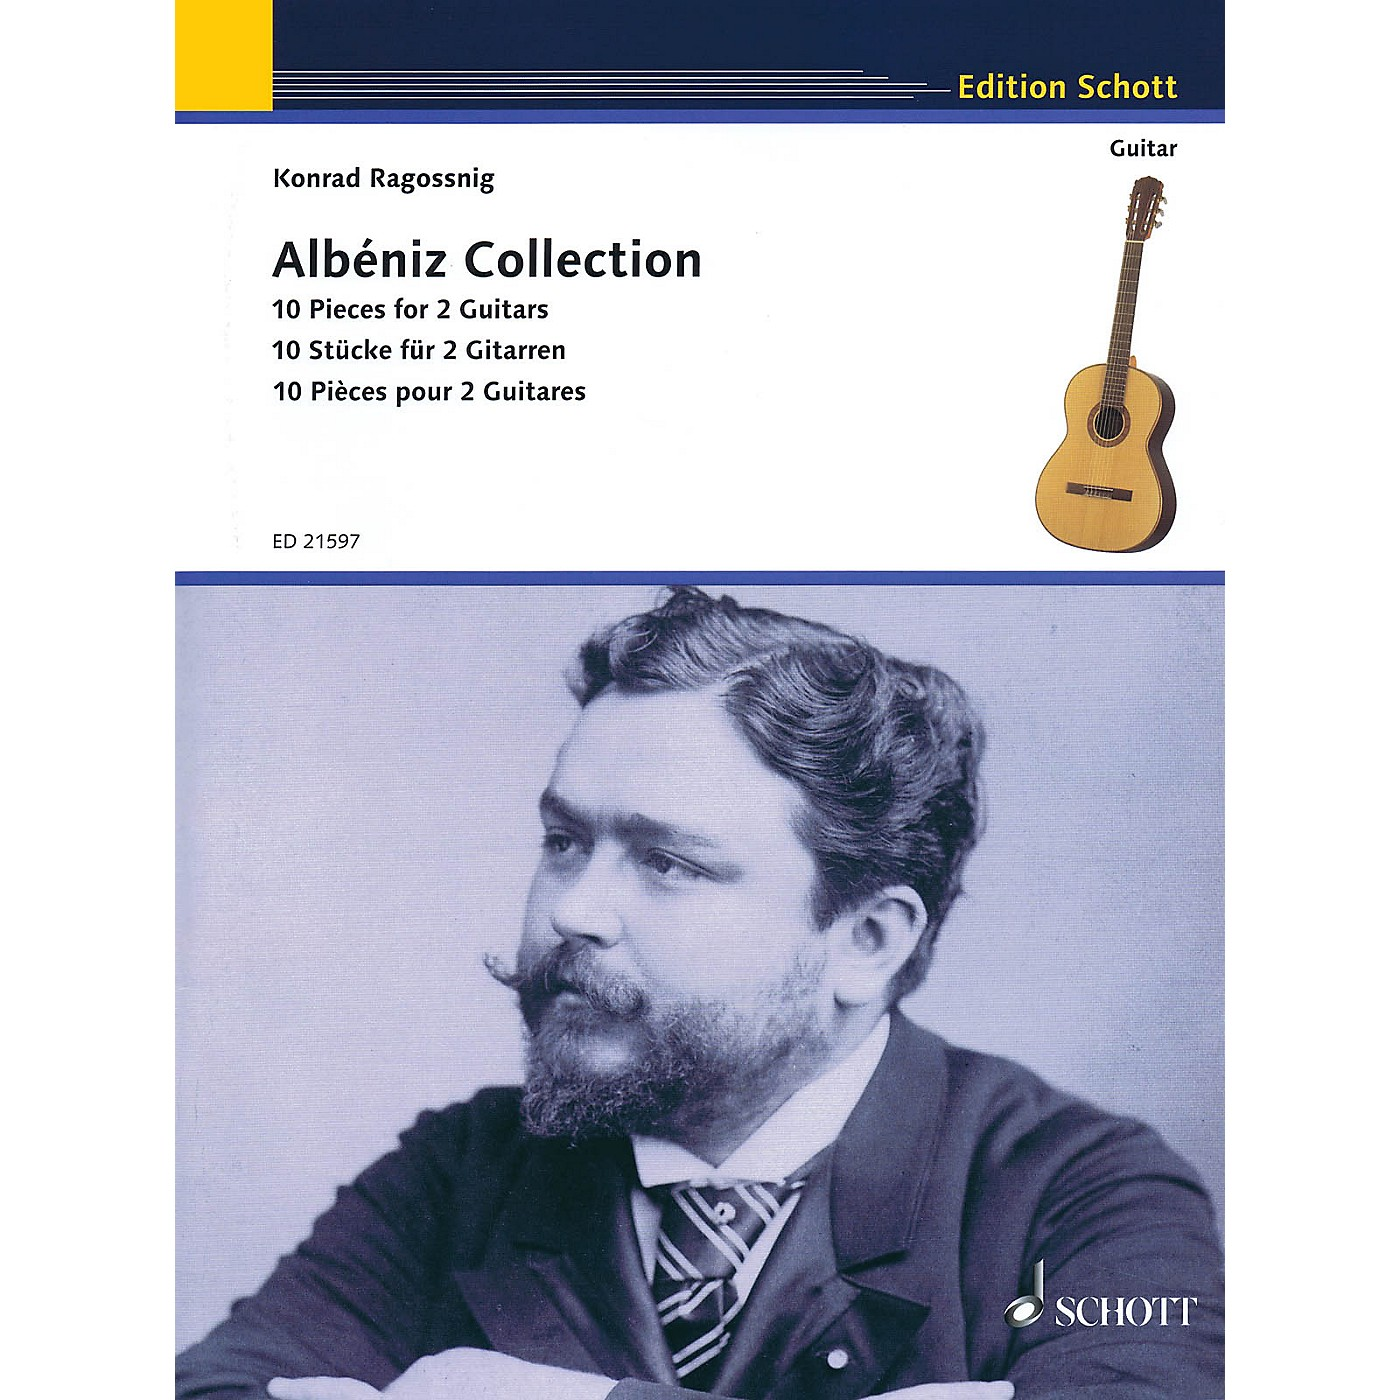 Schott Isaac Albéniz - Albéniz Collection (10 Pieces for Two Guitars Performance Score) Guitar Series Softcover thumbnail